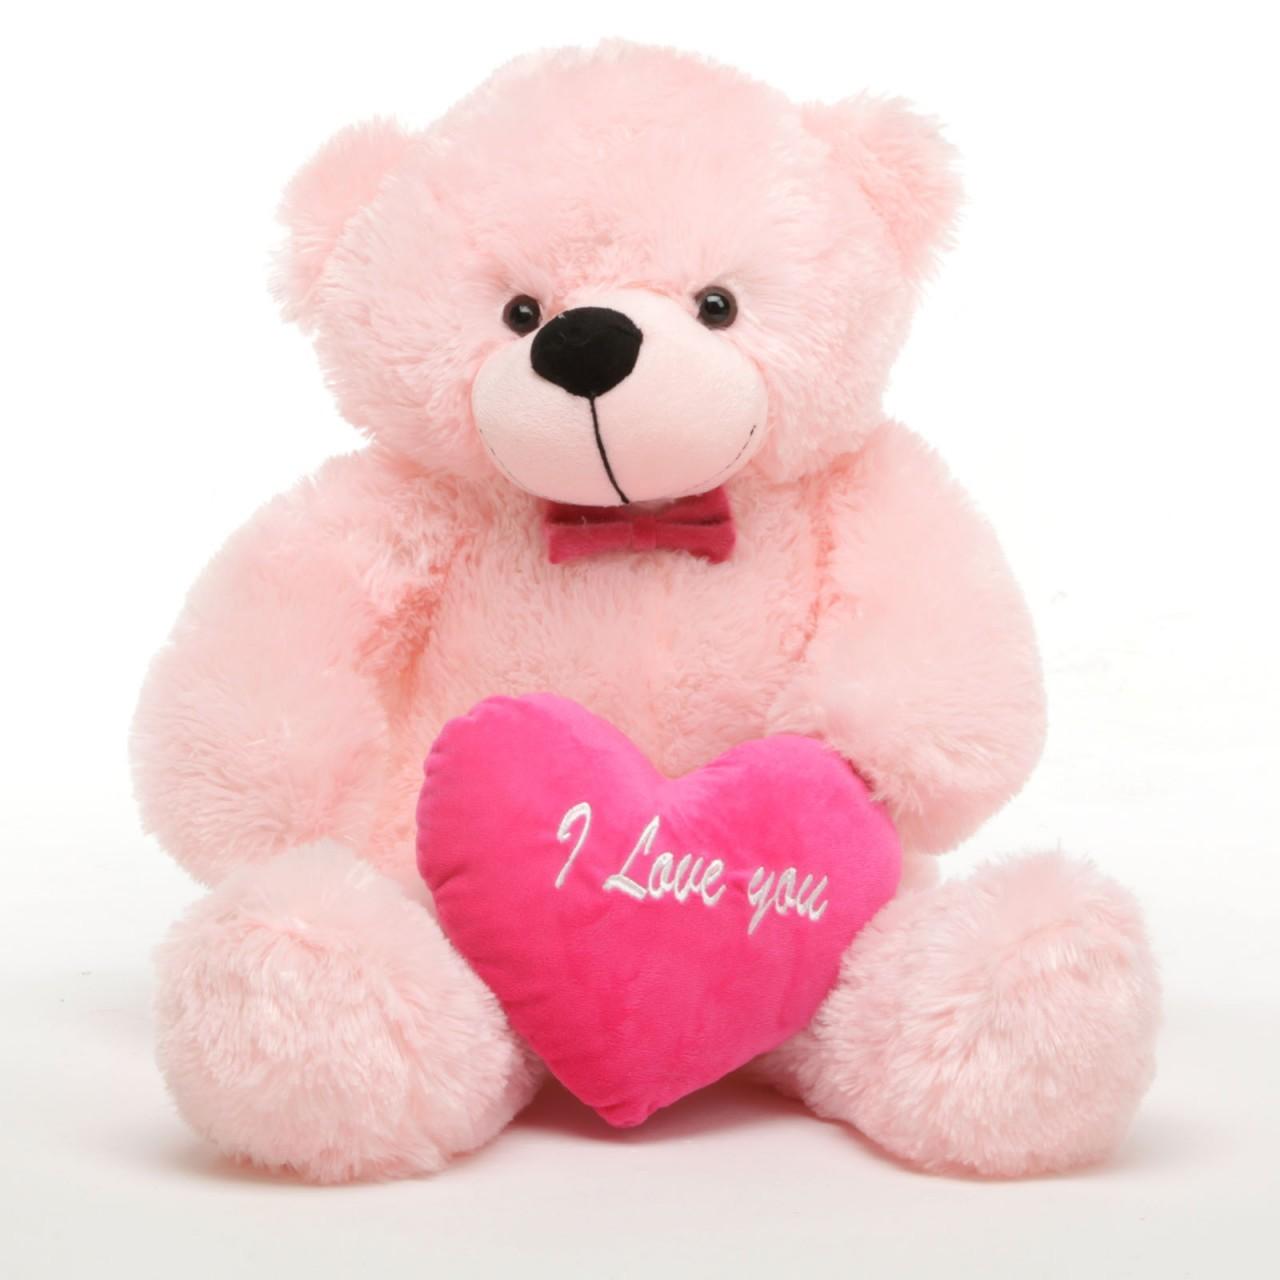 Pink cute teddy bear wallpapers - photo#20